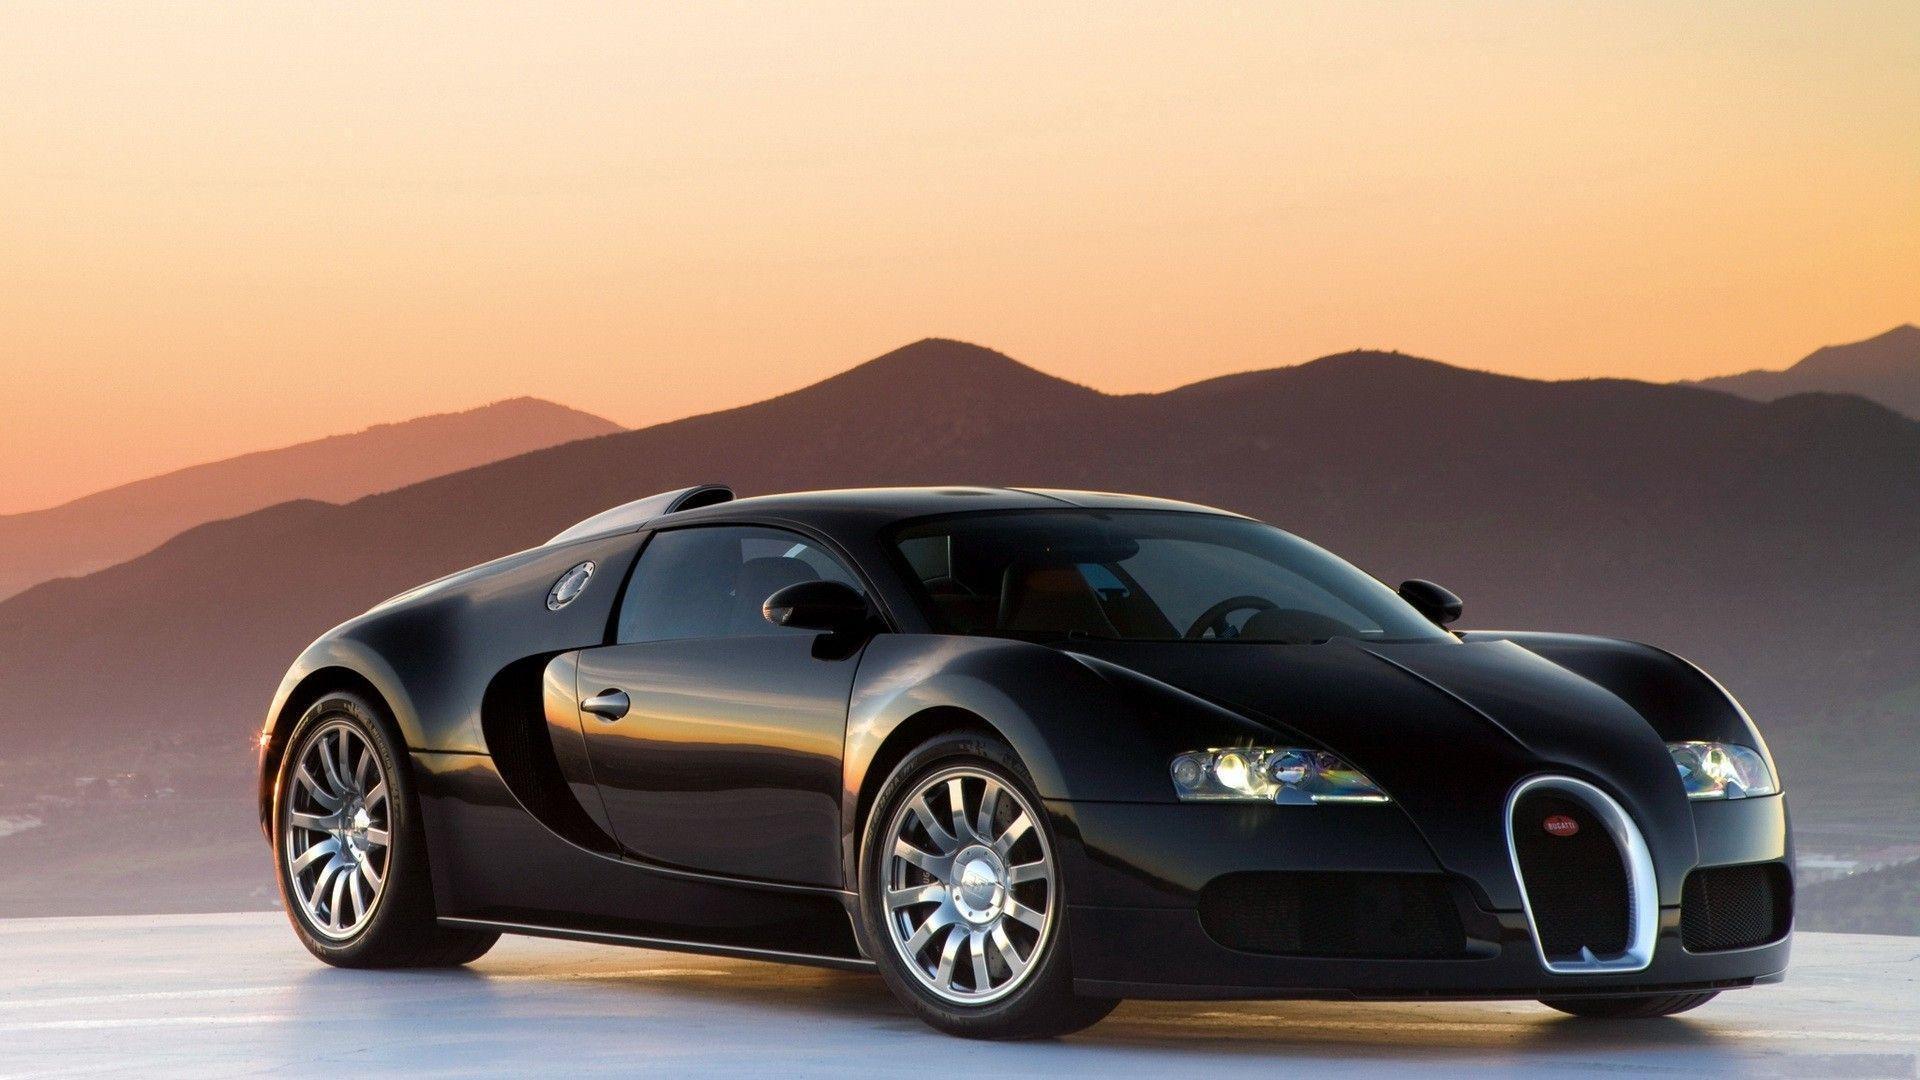 Wallpaper Full Hd 1080p Lamborghini New 2018 79 Images: Wallpapers Full HD 1080p Lamborghini New 2015